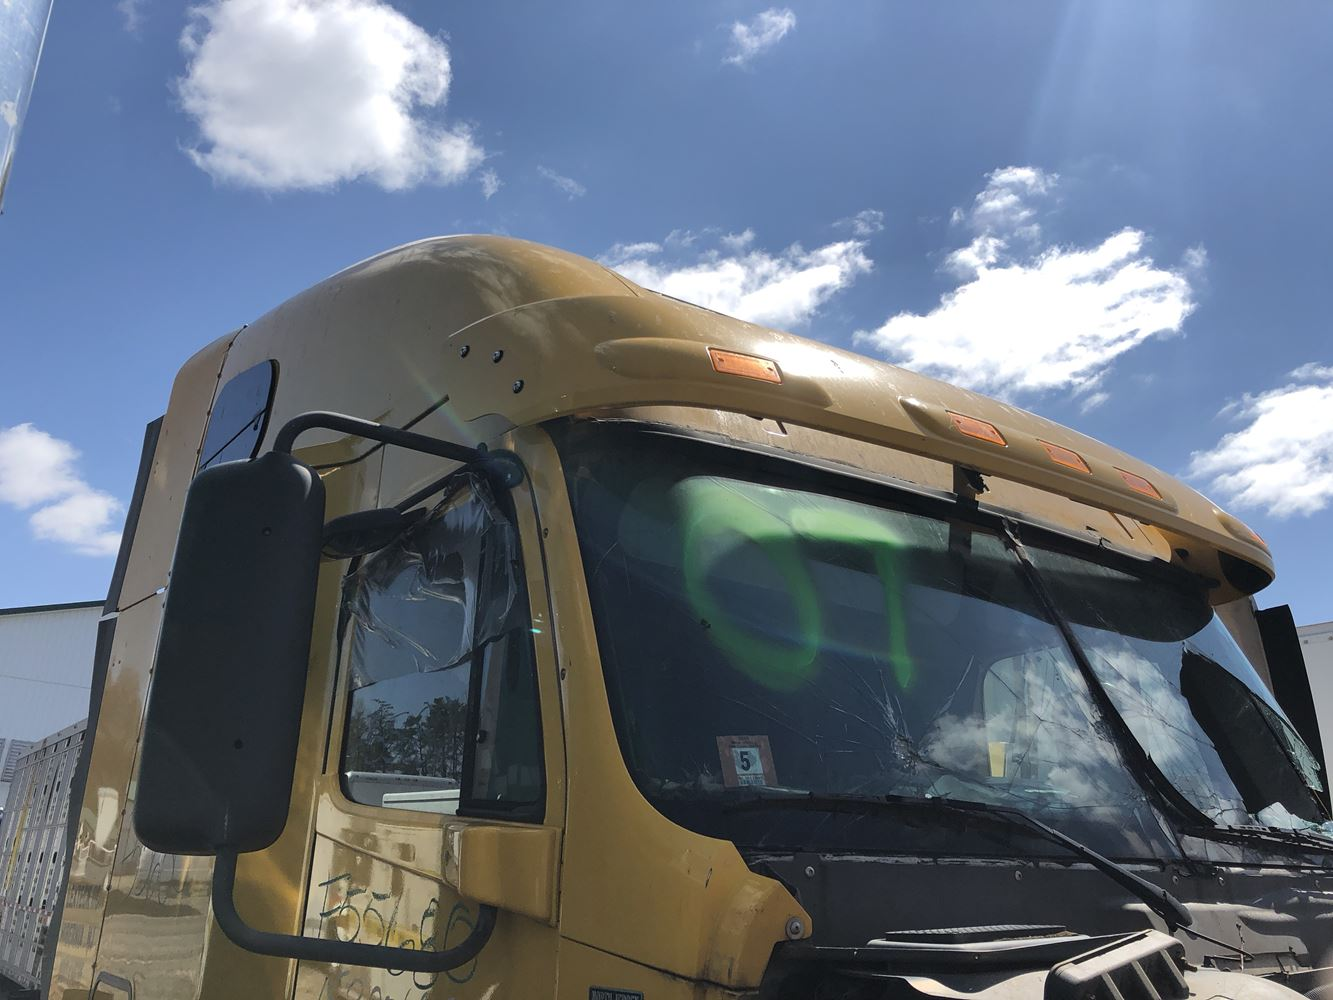 Roof Fairings For Semi Trucks : Freightliner columbia stock p roof